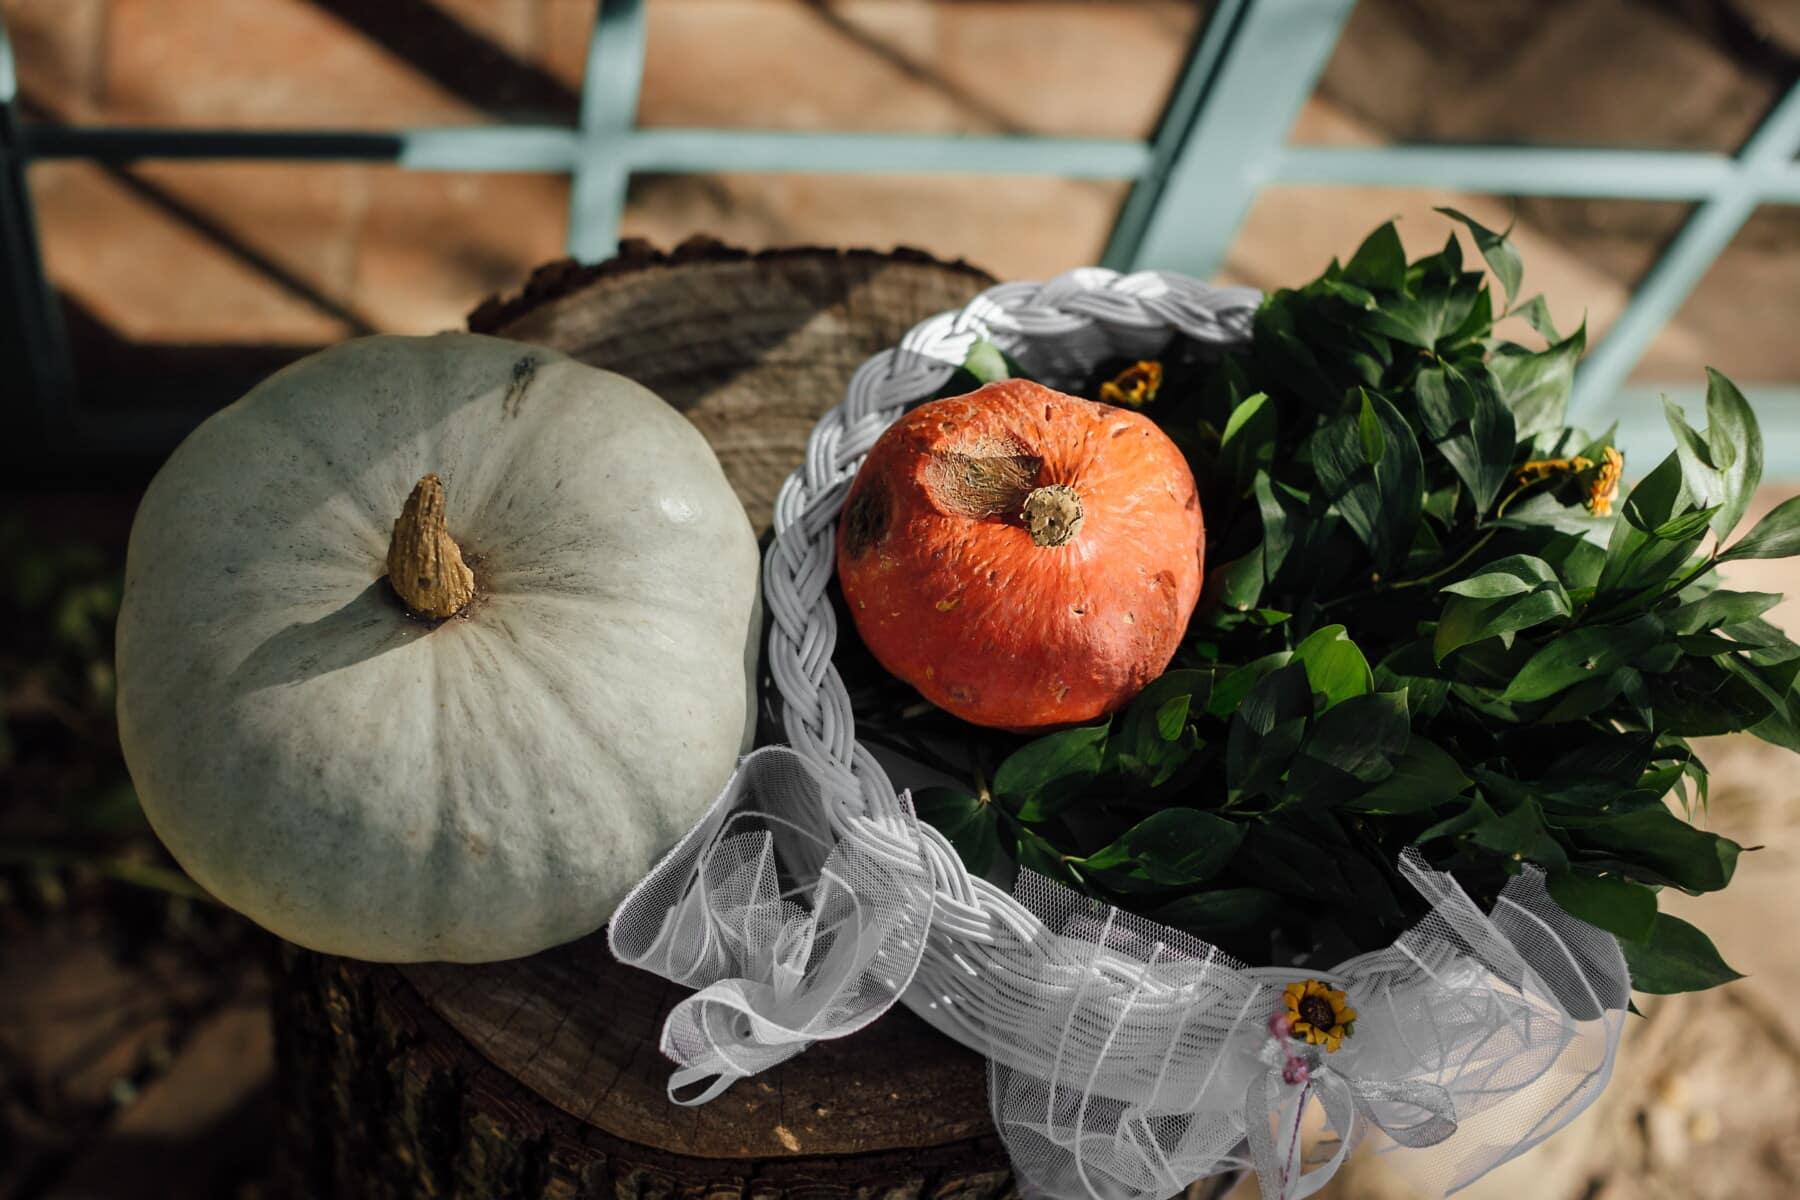 pumpkin, decoration, still life, autumn season, wicker basket, vintage, autumn, squash, vegetable, produce